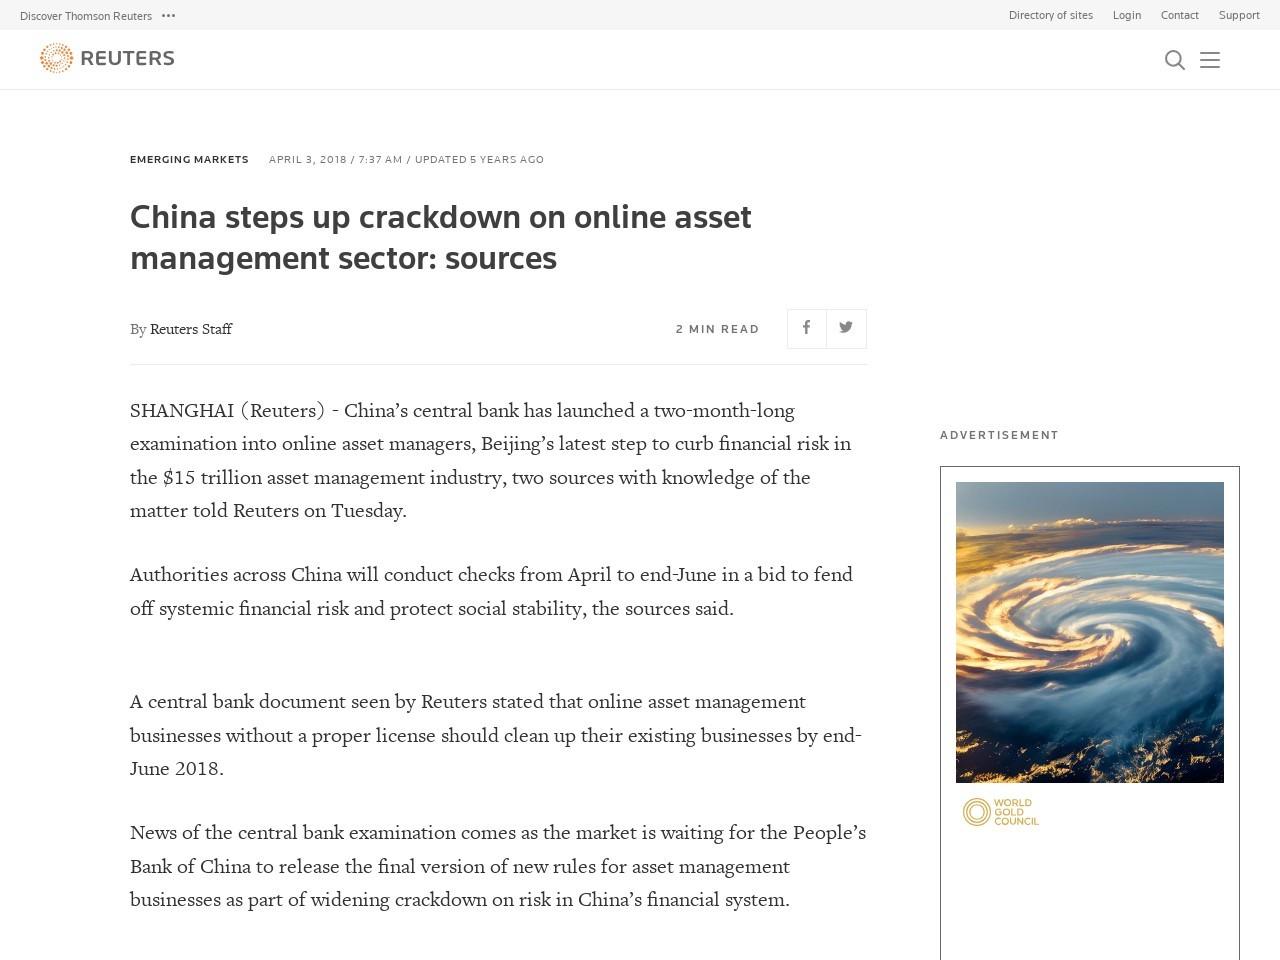 China steps up crackdown on online asset management sector: sources